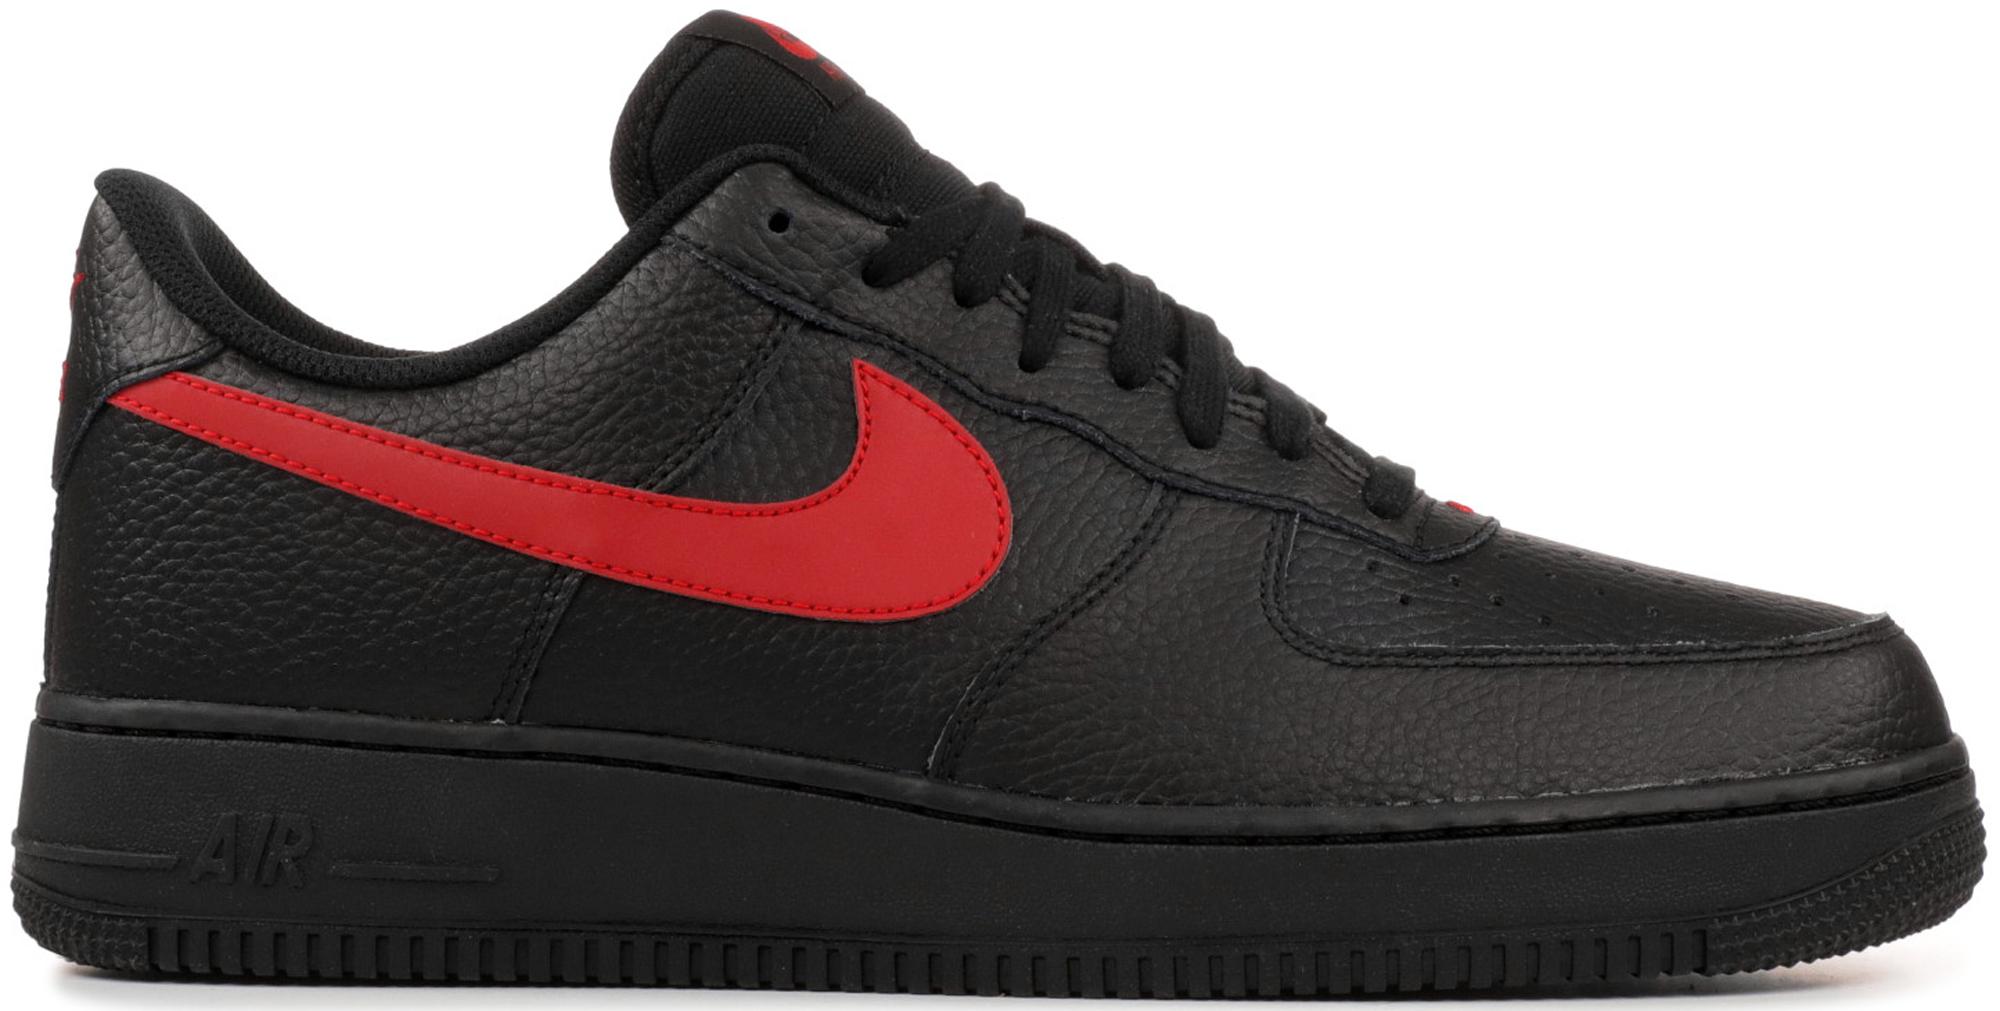 Nike Air Force 1 Low Black University